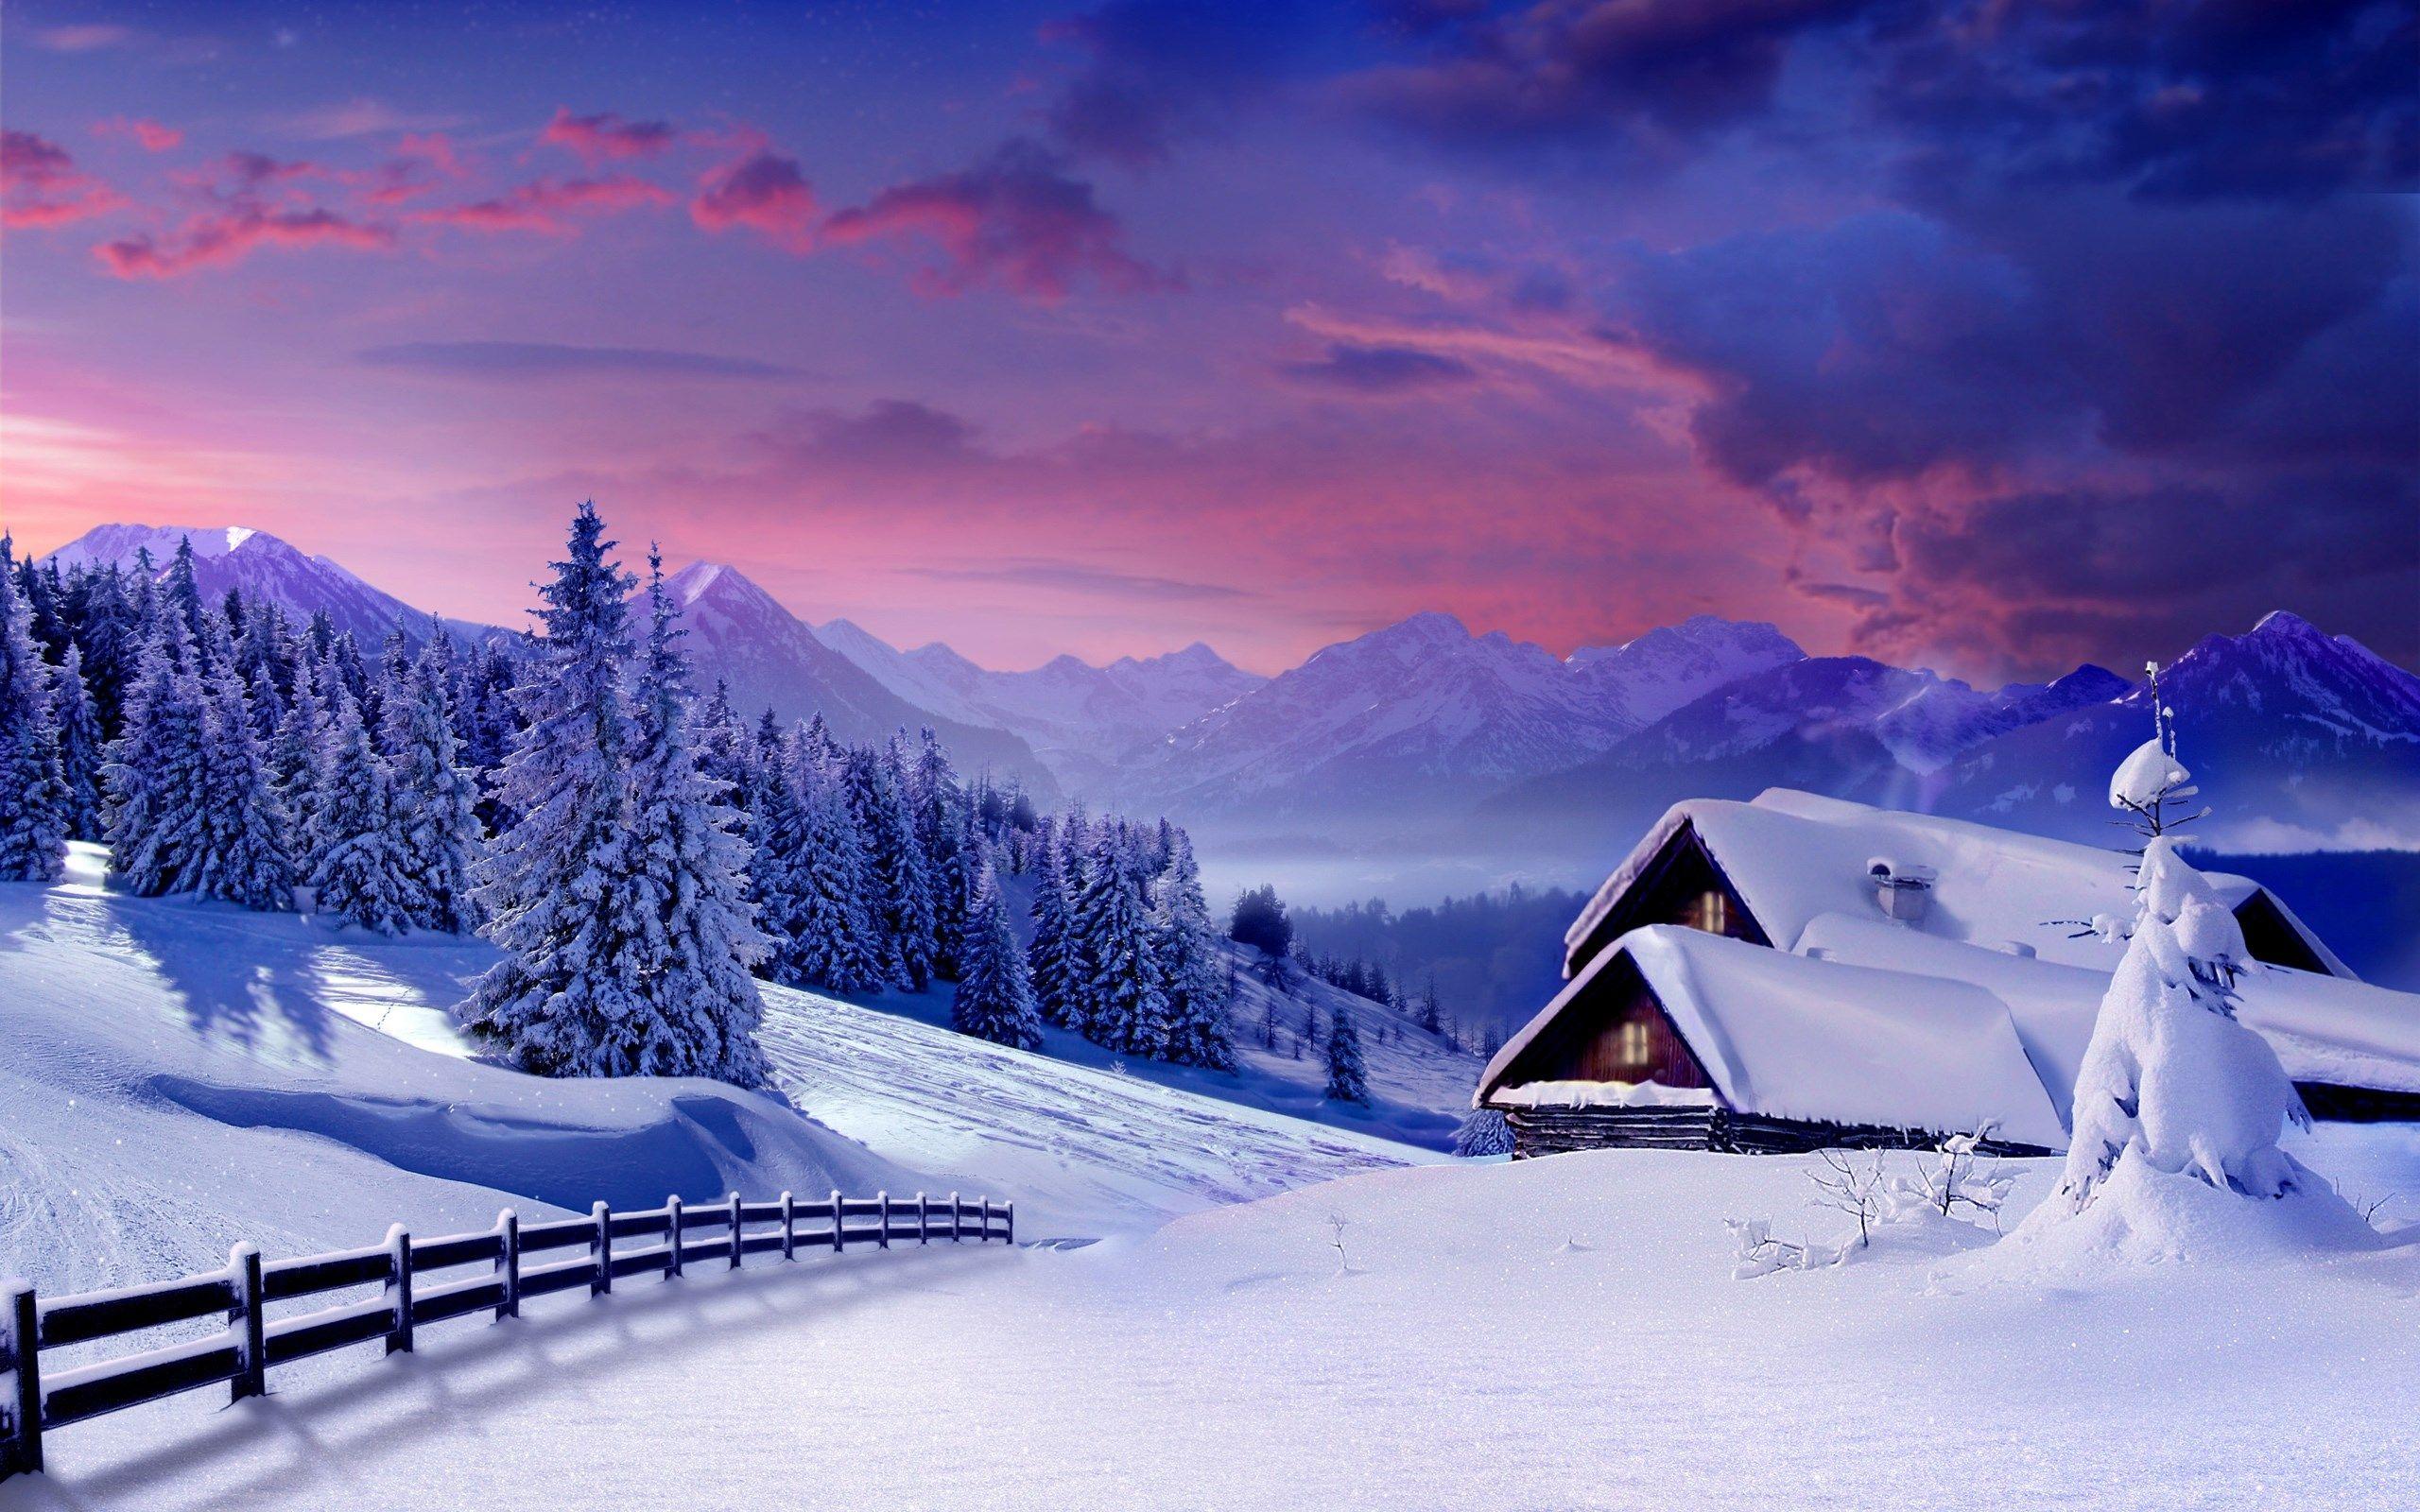 Great Wallpaper High Quality Winter - 4c6e921325efc81c11063e9388c41341  Pic_819743.jpg